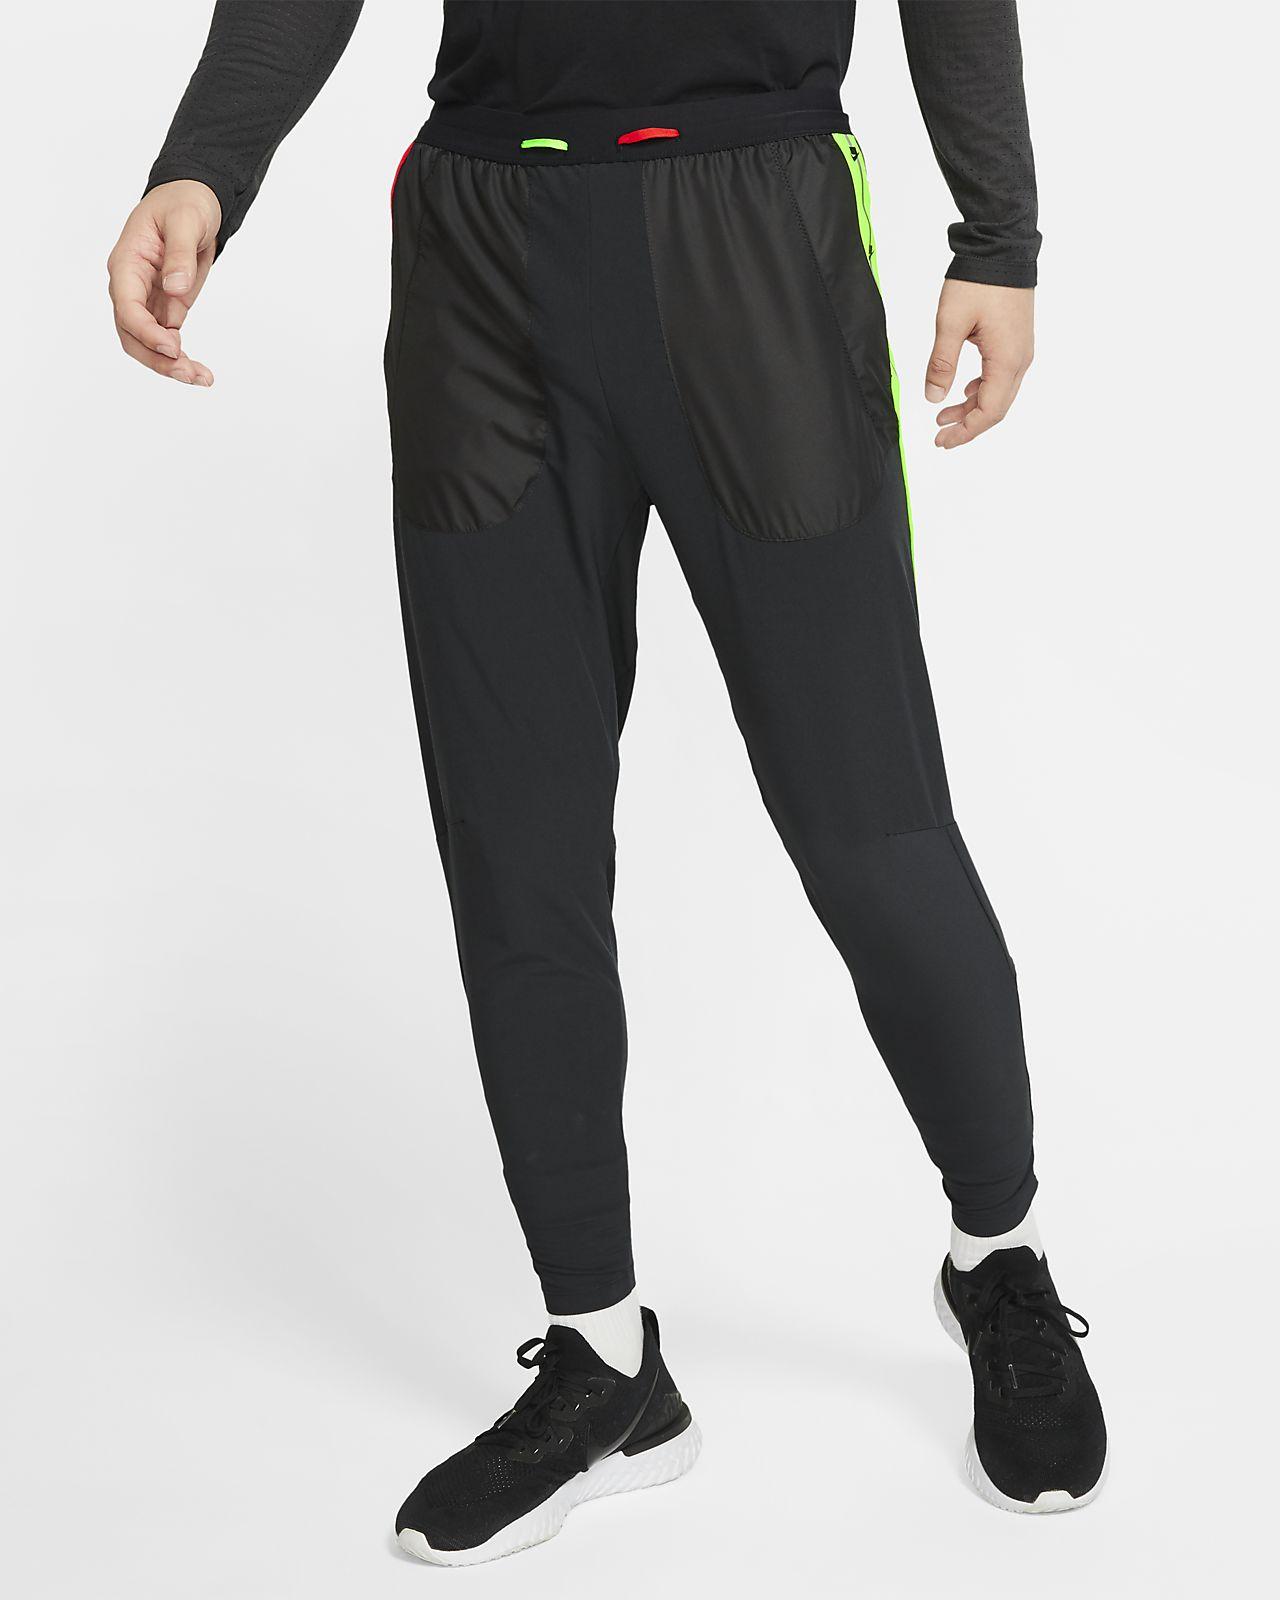 Pantalones de running para hombre Nike Phenom Wild Run